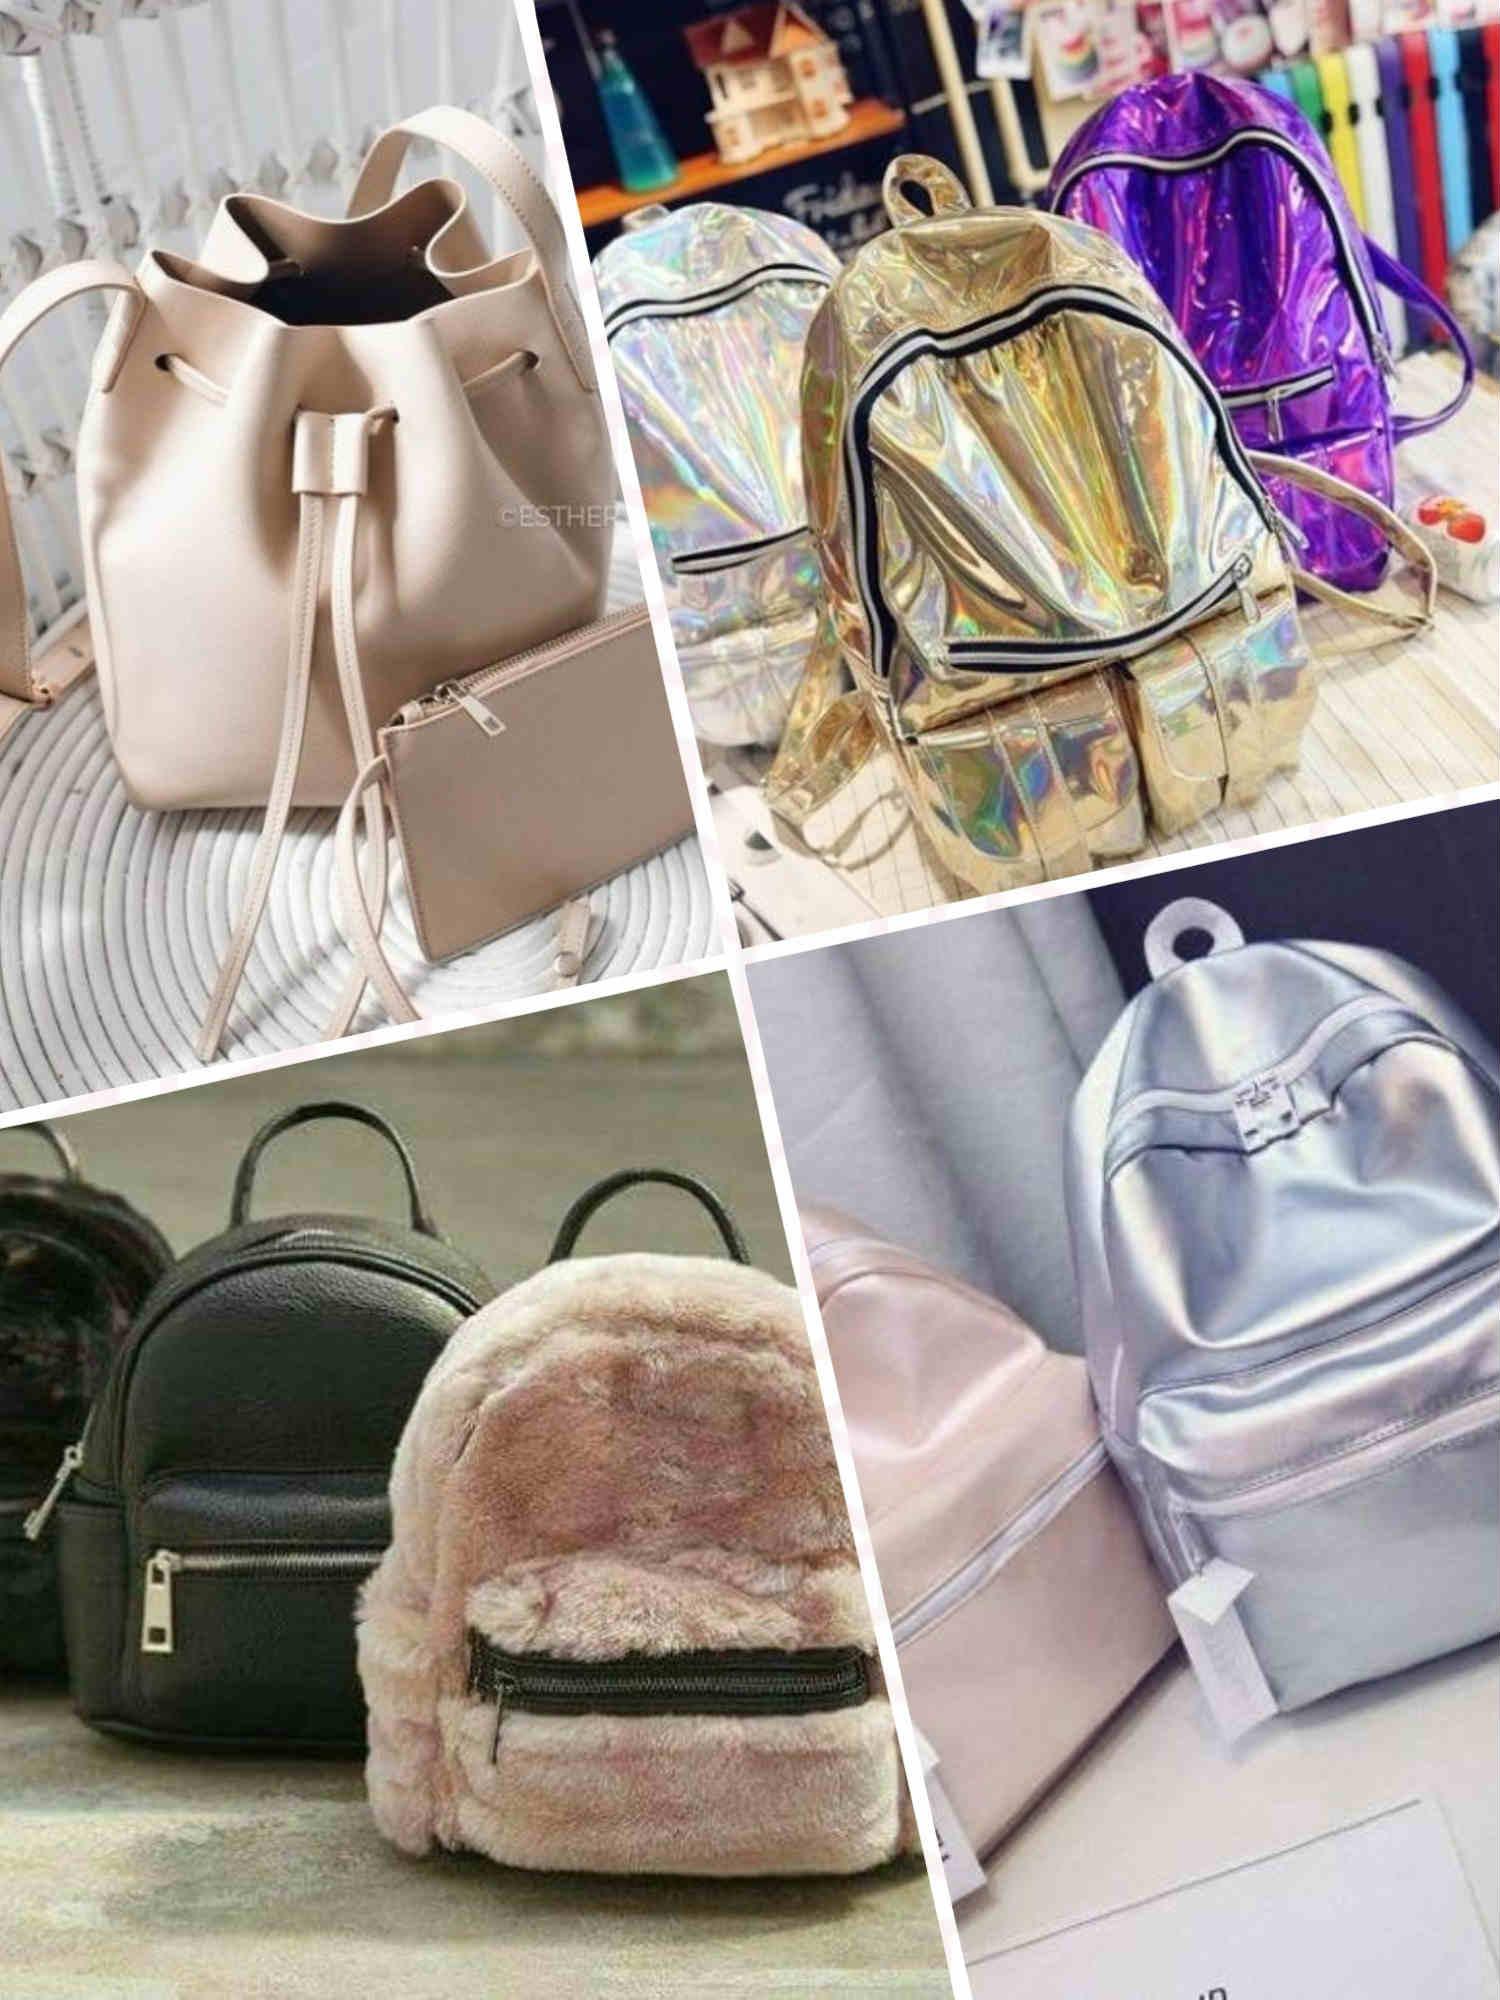 66884c8f63389 بالصور موضة شنط الضهر الجلد و القطيفة velvet and leather back bags - المرأة